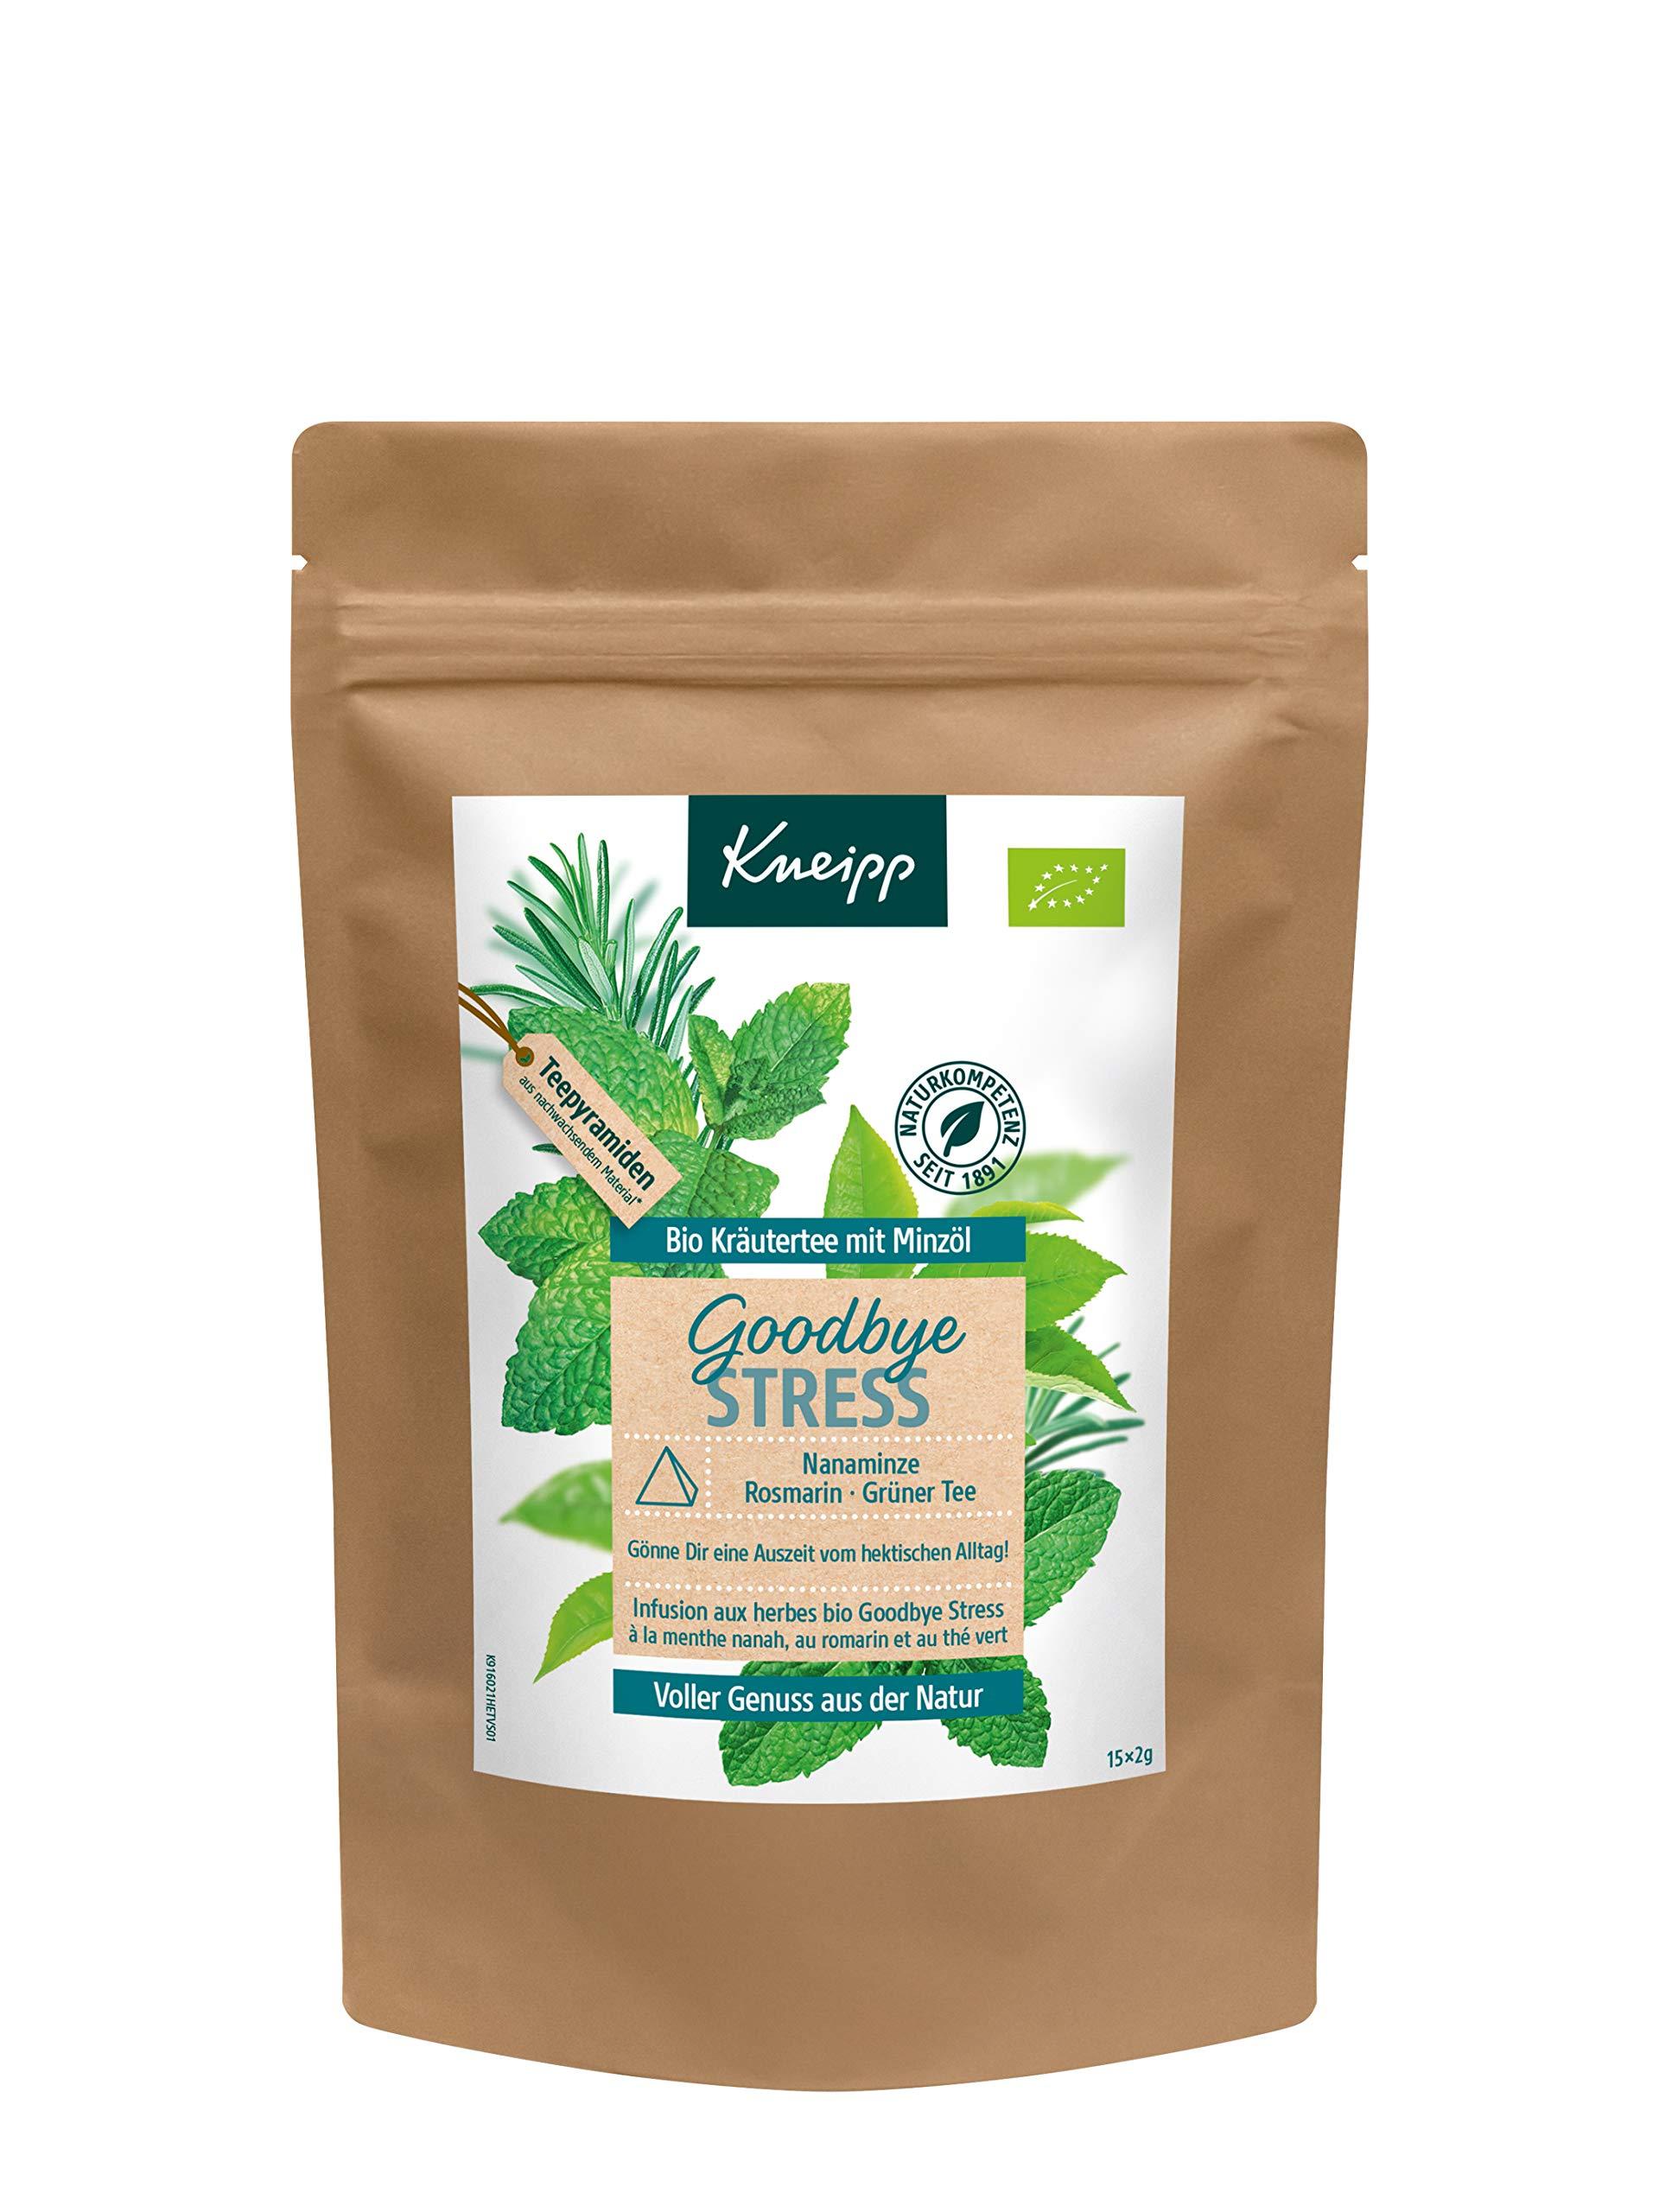 Kneipp-BIO-Krutertee-Goodbye-Stress-30-g